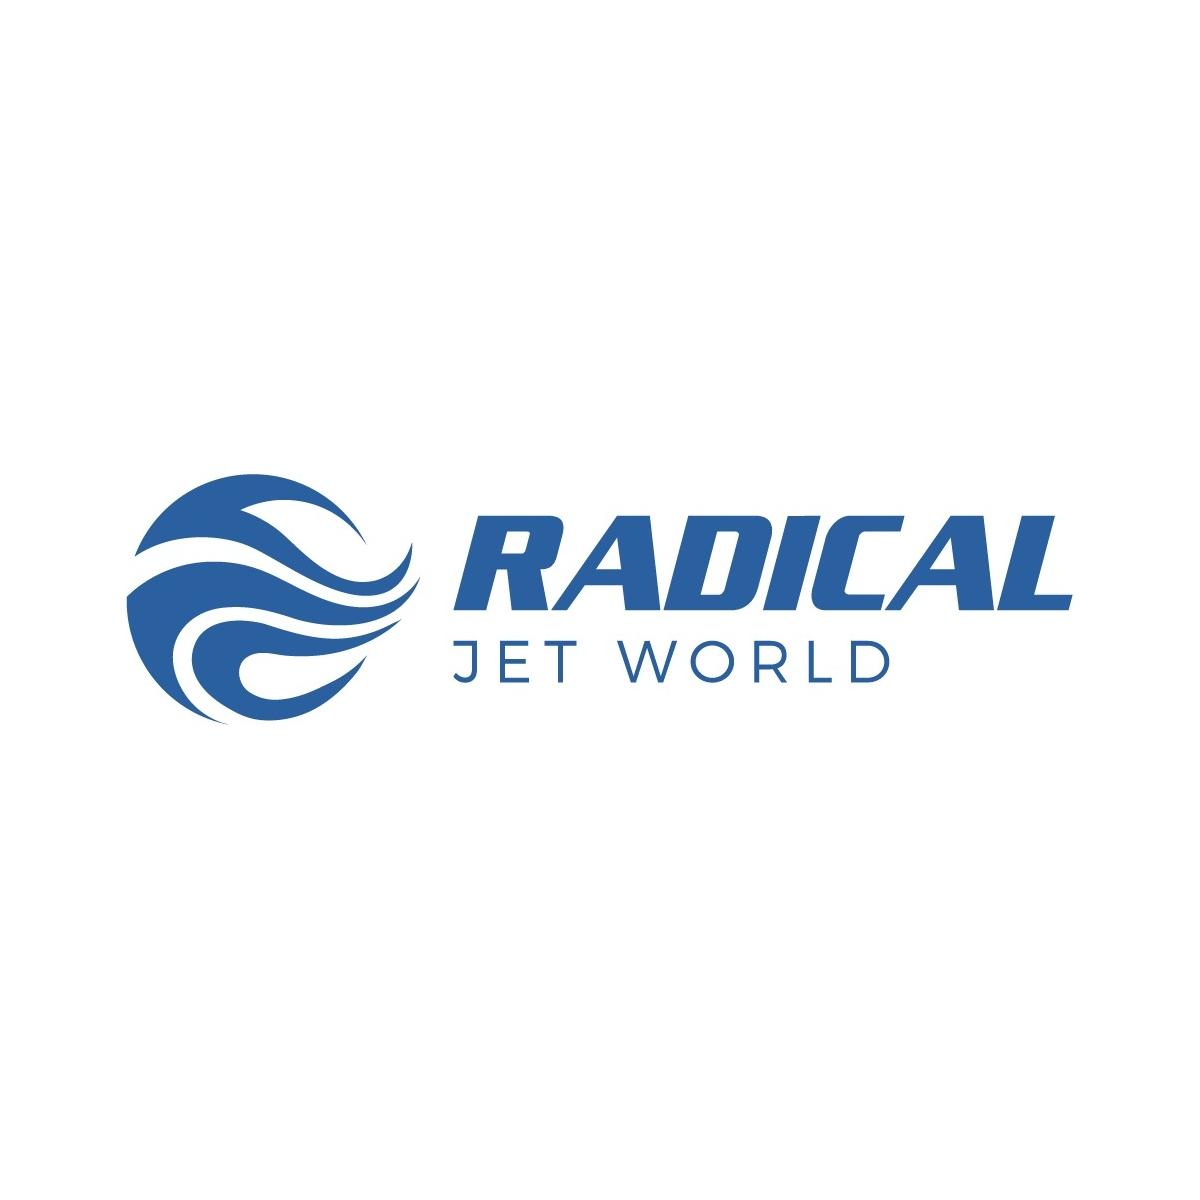 Bobina Vela para Jet Ski Sea Doo GTI/GTS/SP97/SPX/XP/GTX/GSX  - Radical Peças - Peças para Jet Ski